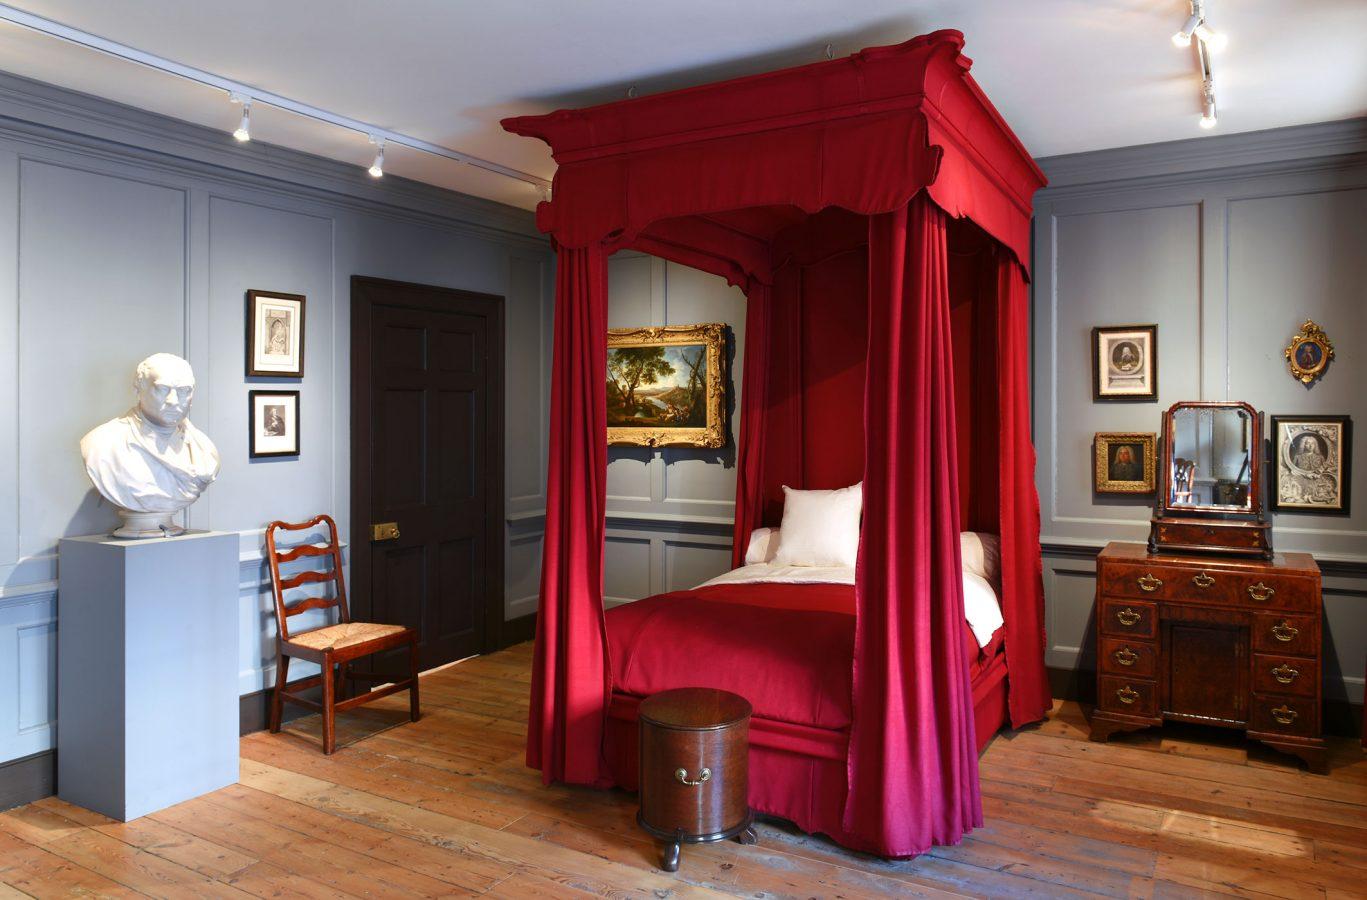 Handel Hendrix in London The Bedroom in which Handel died